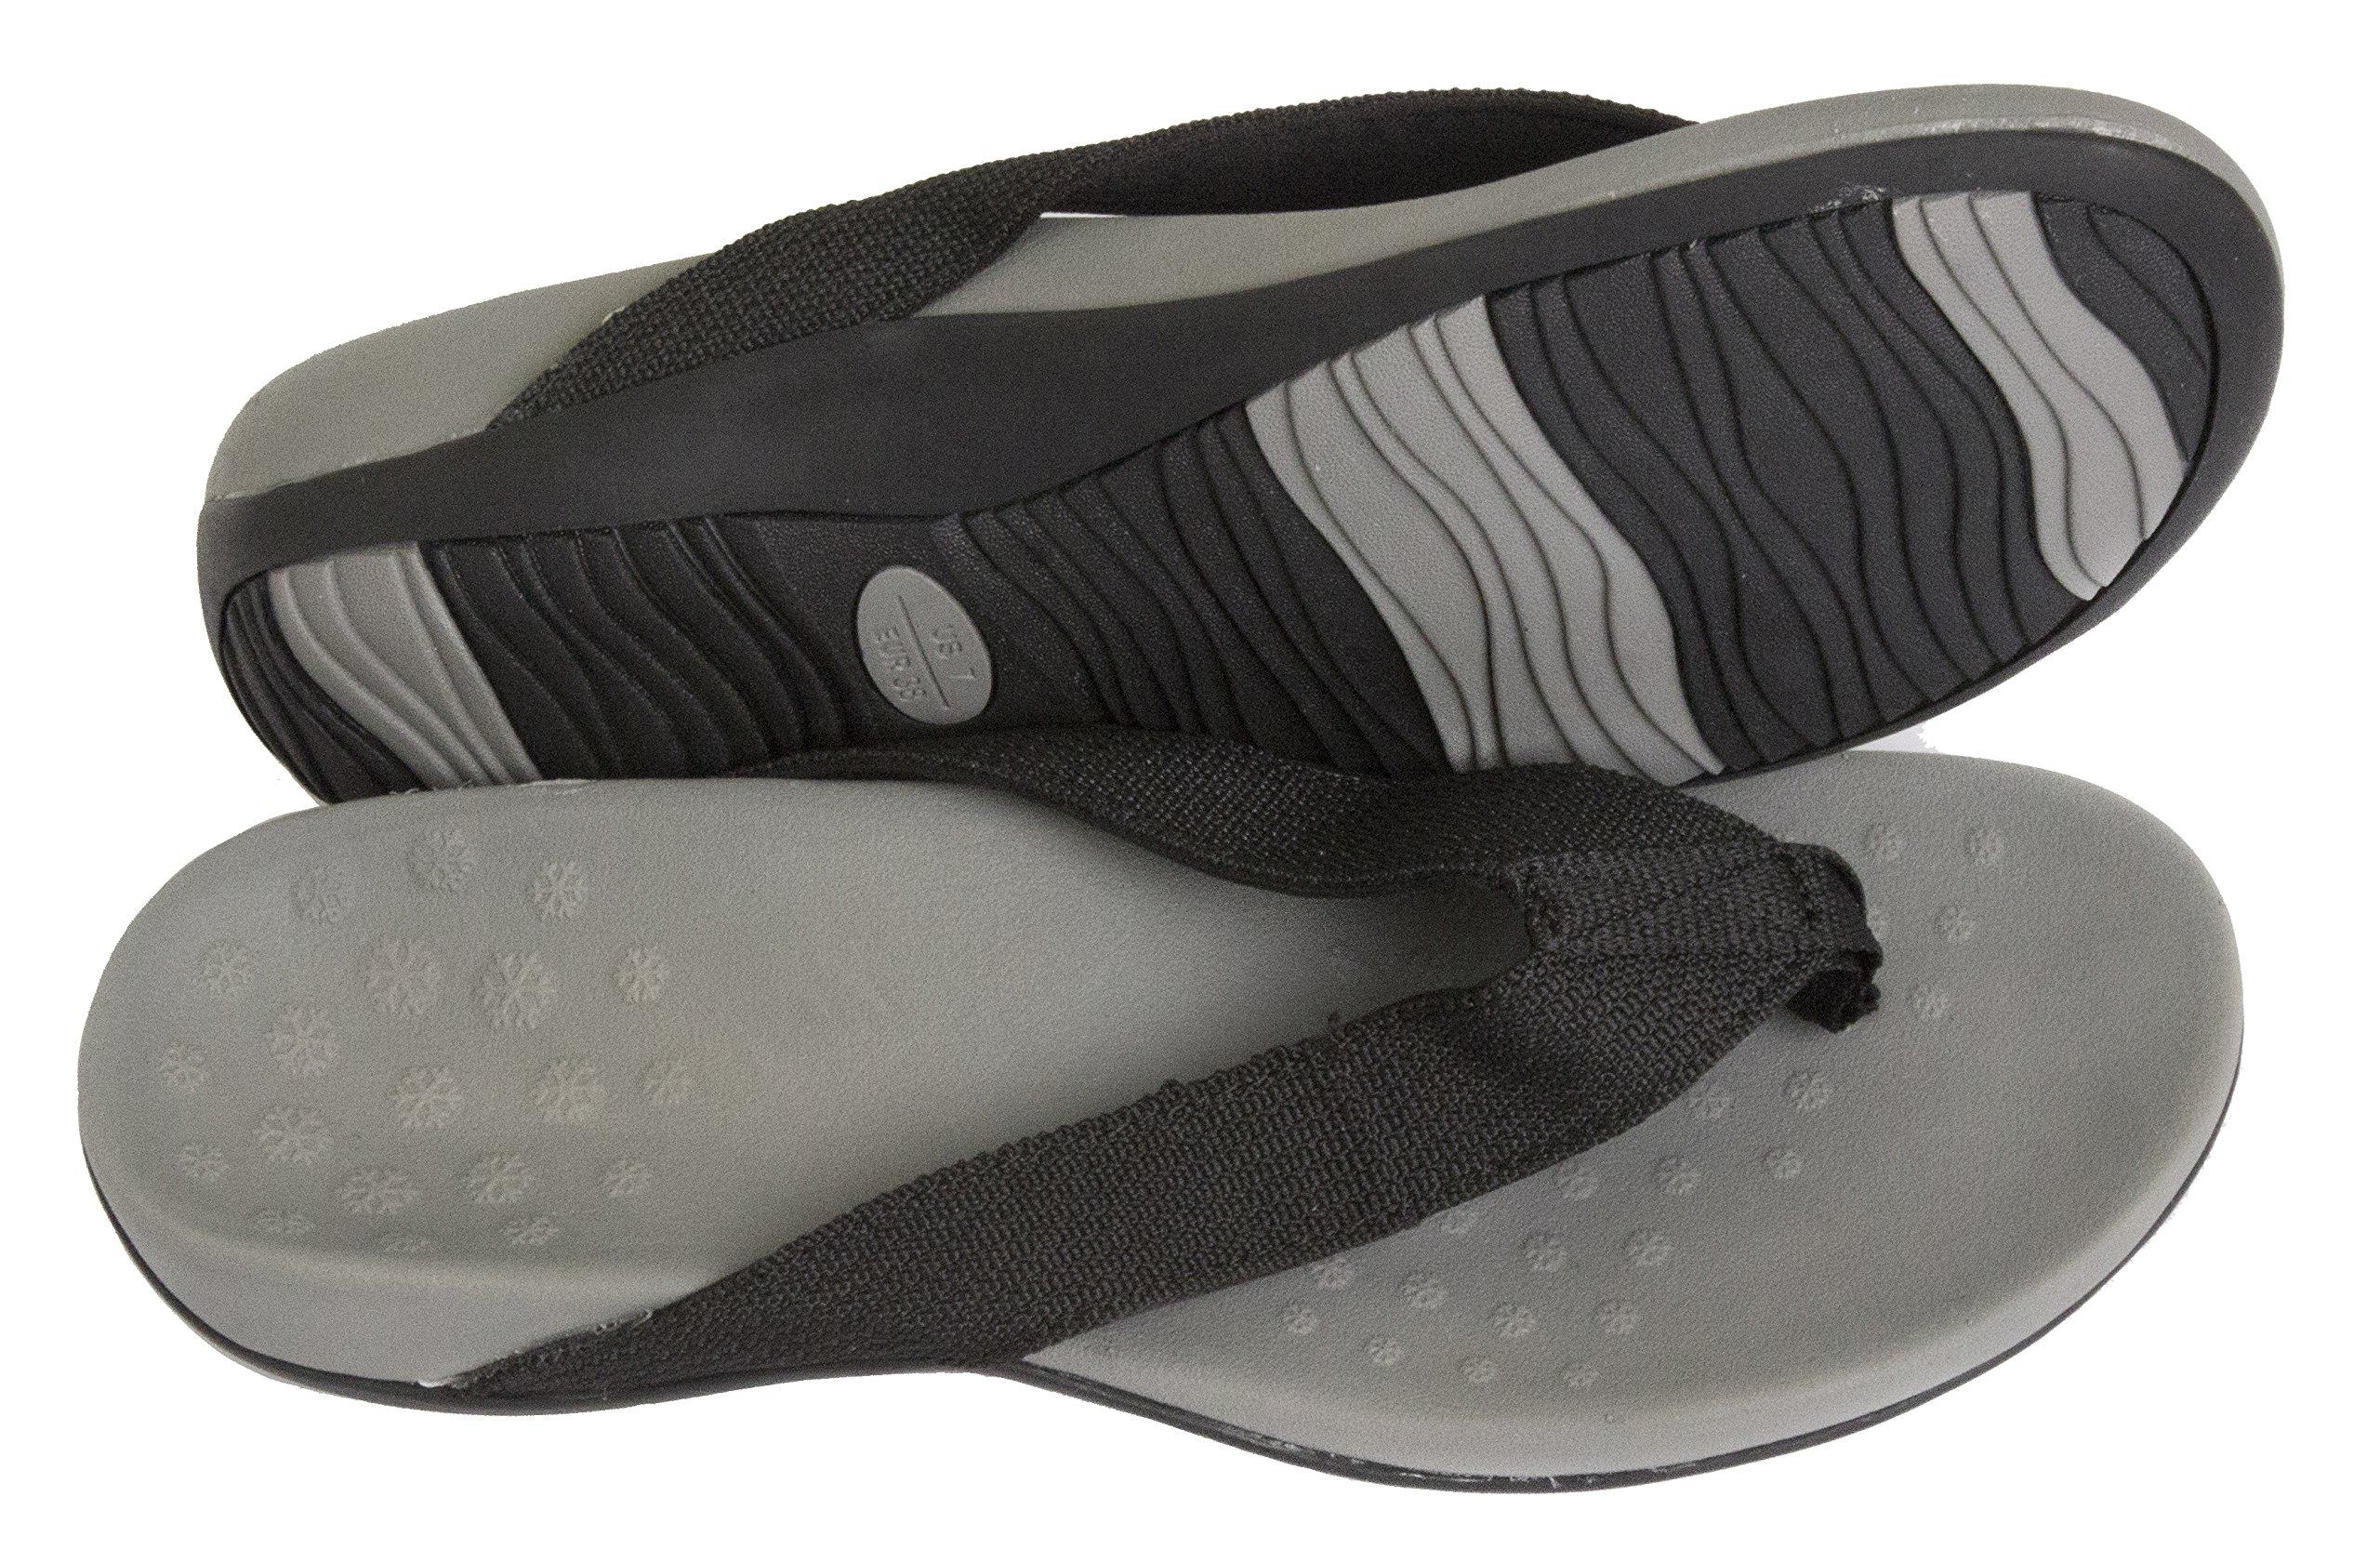 Excellent The Ladyu0026#39;s Plantar Fasciitis Sport Sandals Shoes Orthaheel Size 11 Waterproof | EBay